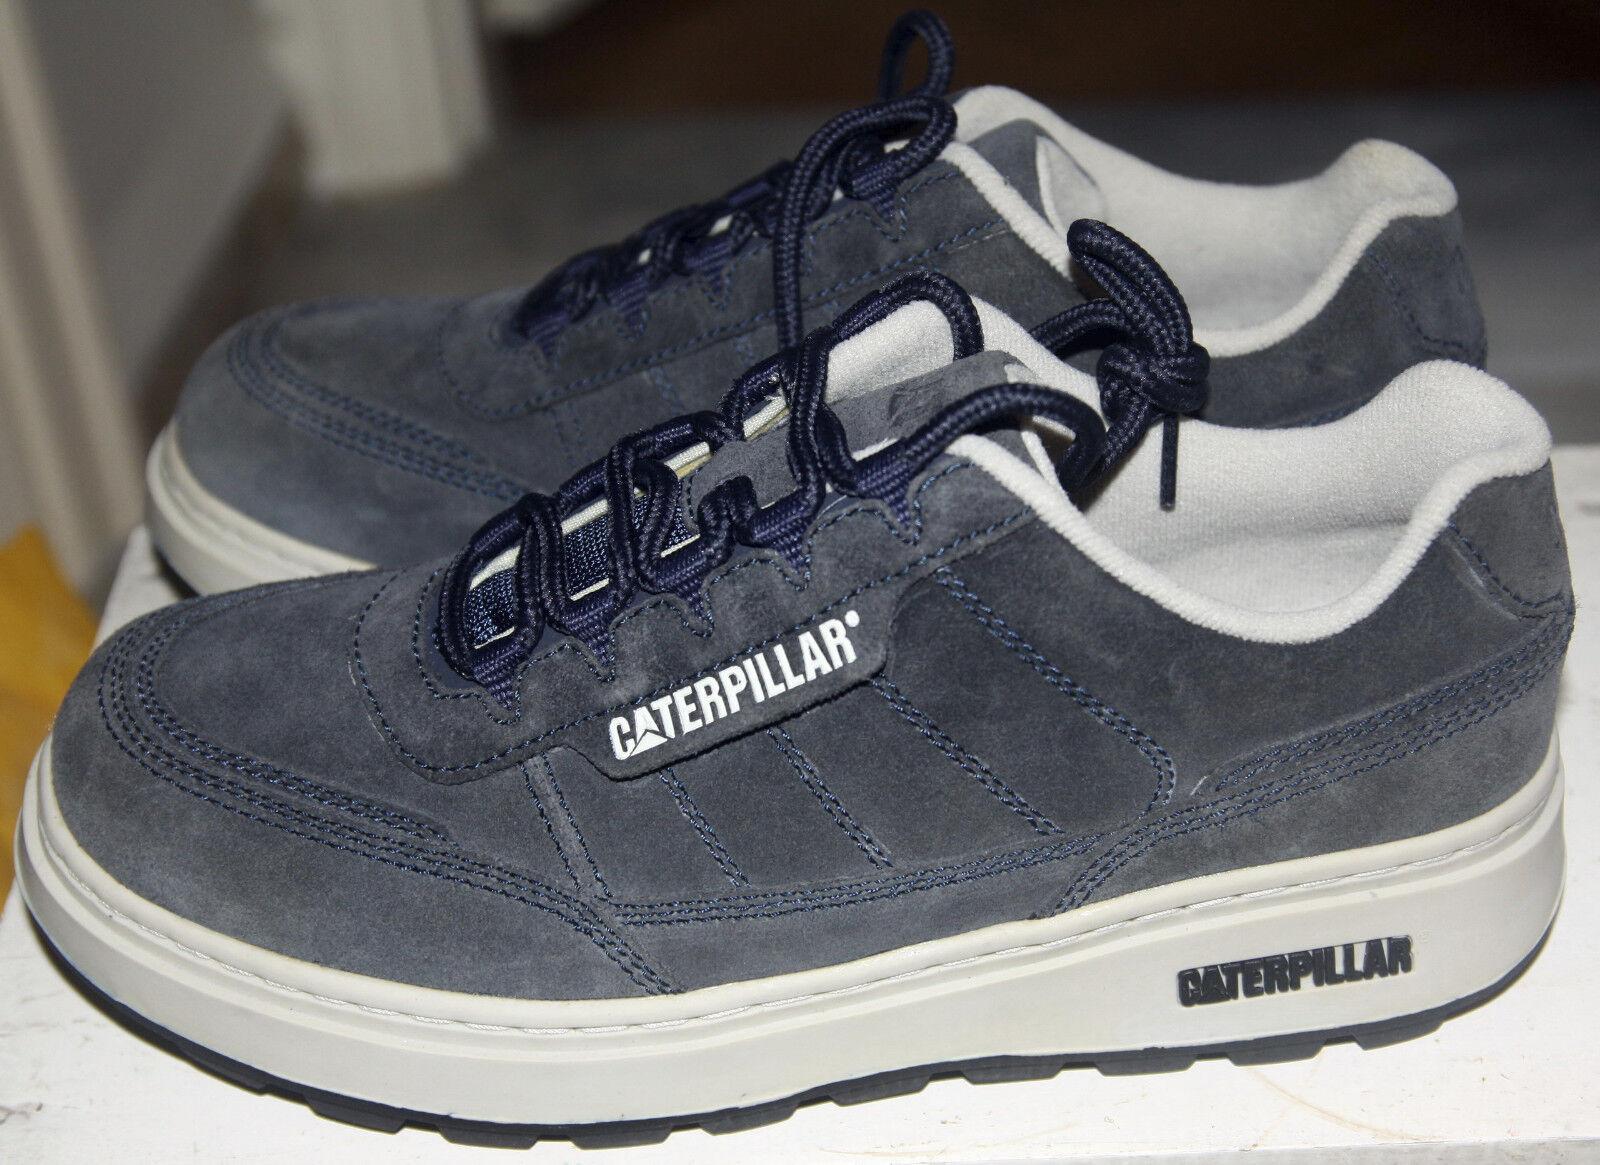 CAT Caterpillar Fluid 702055 Vintage Old Stock EU 42 US 9 Navy BNIB UVP: 84.90